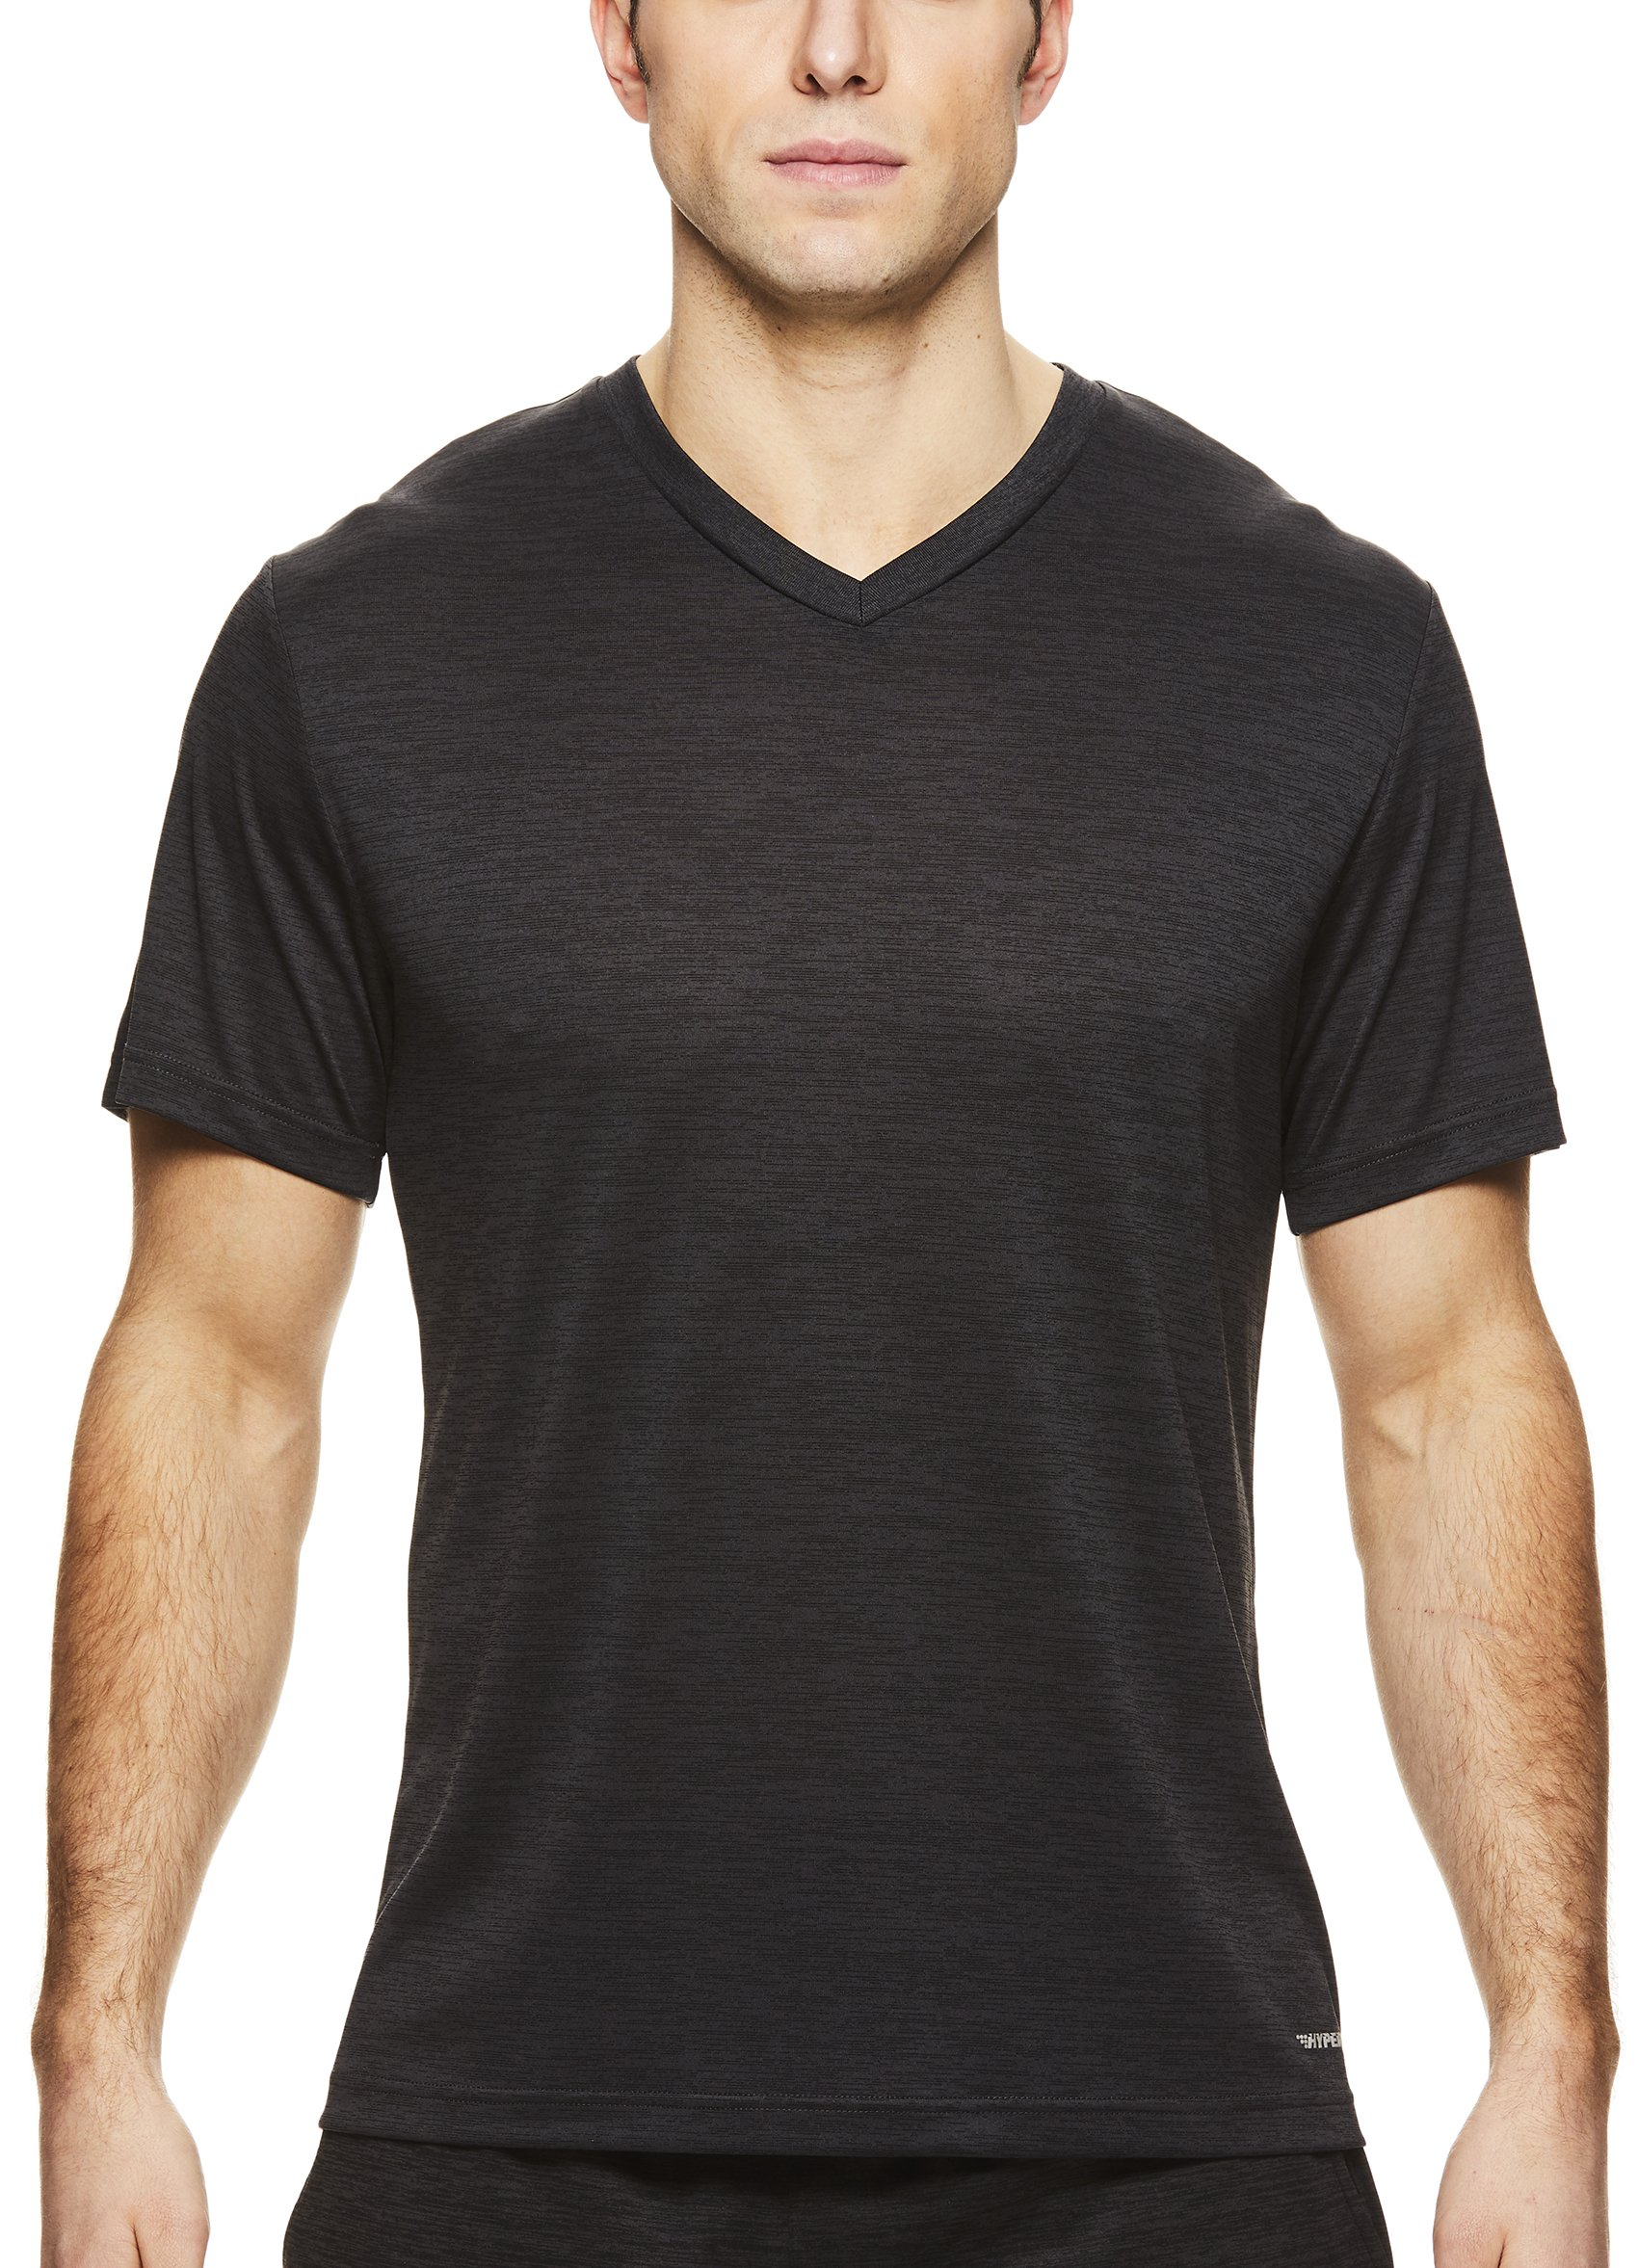 HEAD Men's V Neck Gym Training & Workout T-Shirt - Short Sleeve Activewear Top - Flash Black Heather, Medium